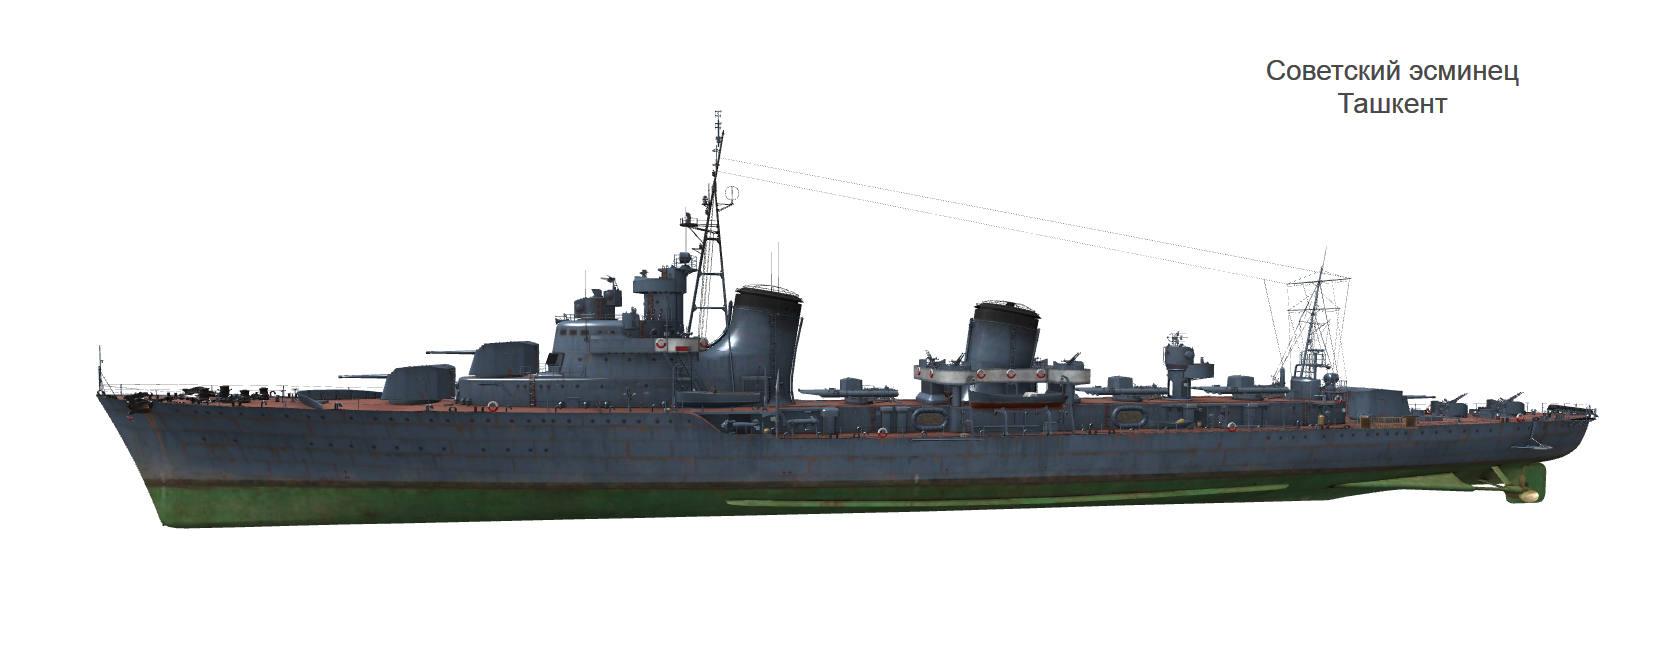 Советский эсминец Ташкент